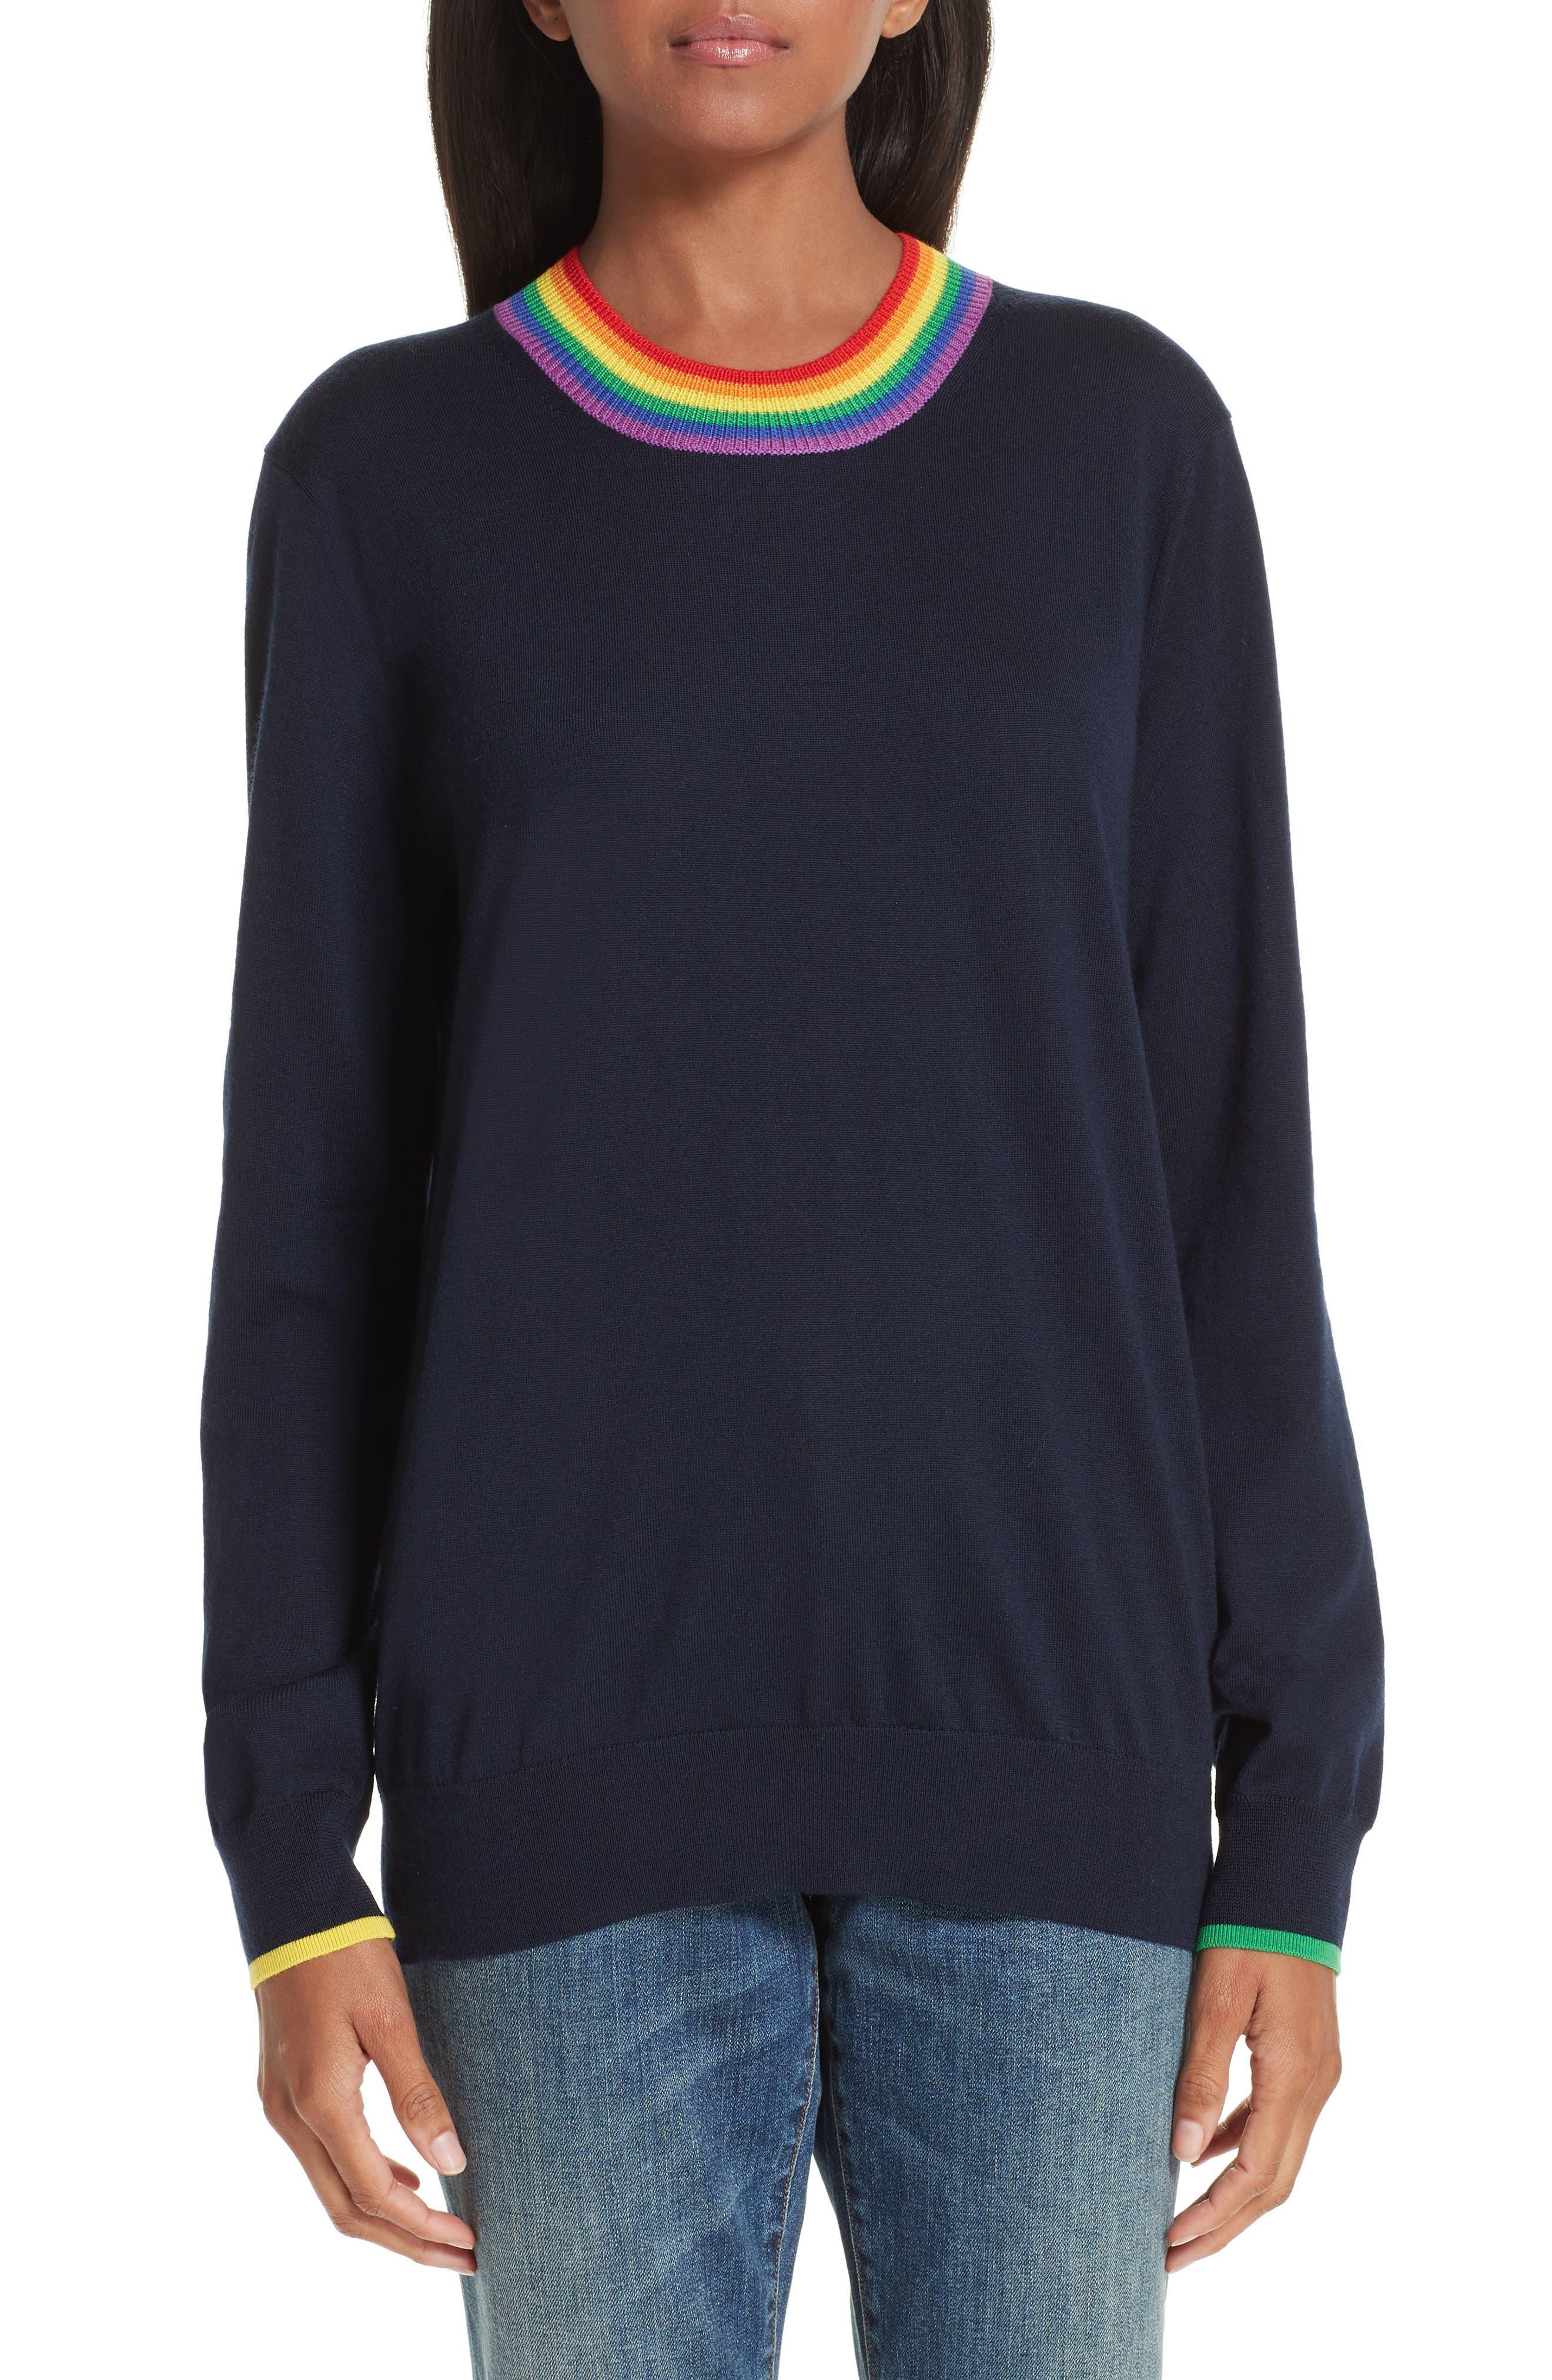 Burberry Dales Rainbow Trim Merino Wool Sweater, Blue